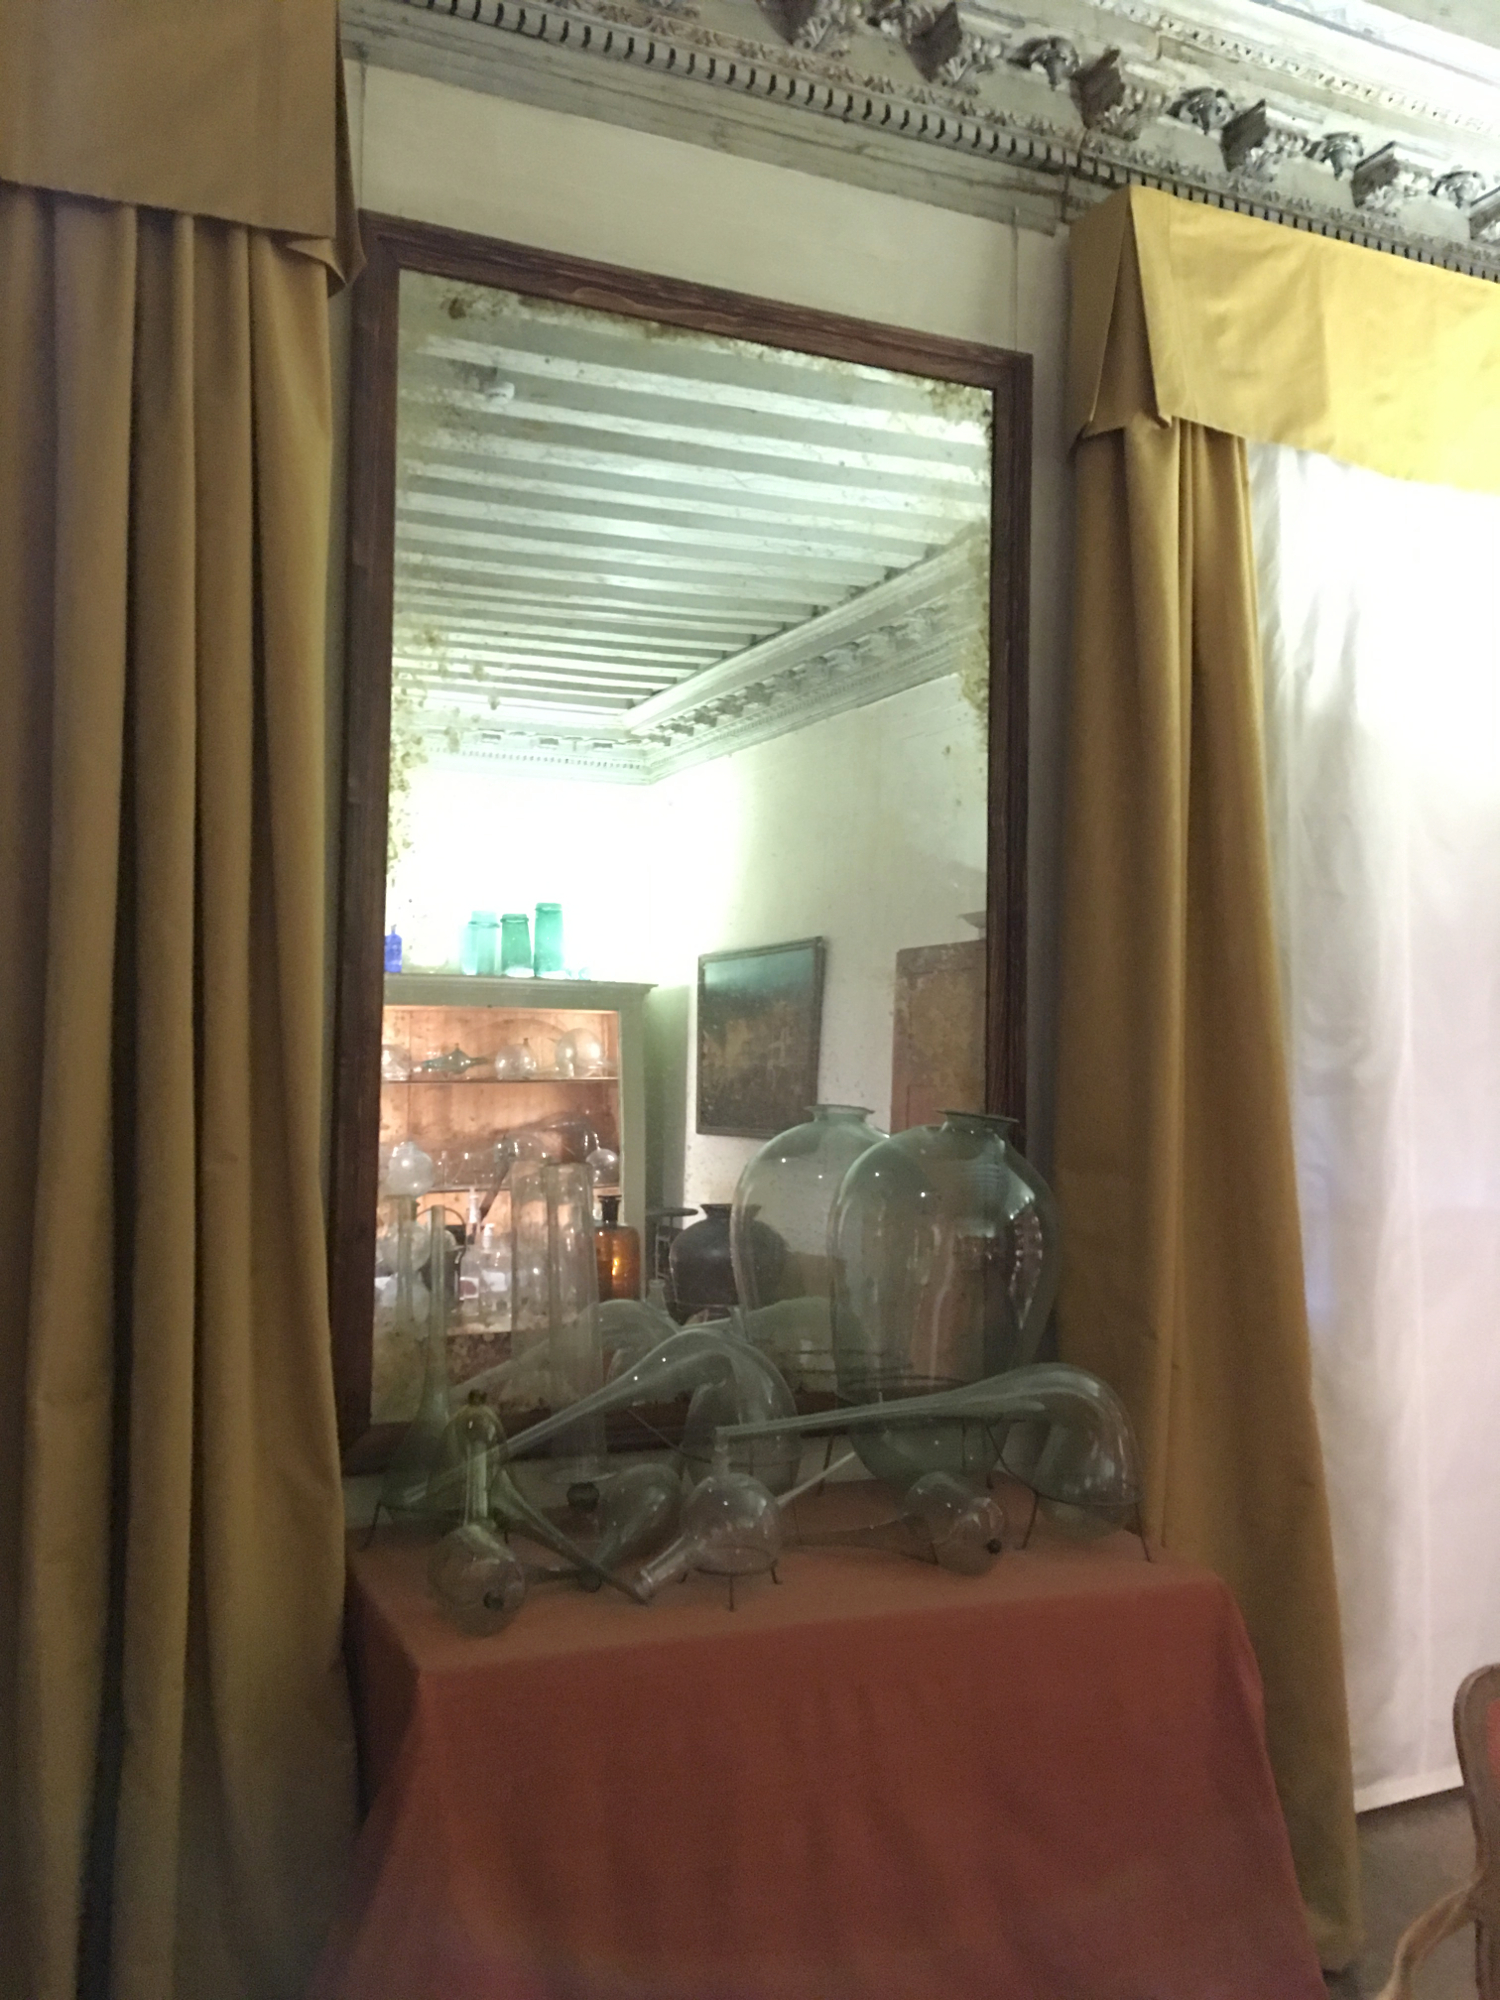 rocaille-blog-venezia-palazzo-mocenigo-percorso-profumo-mavive-vidal-54